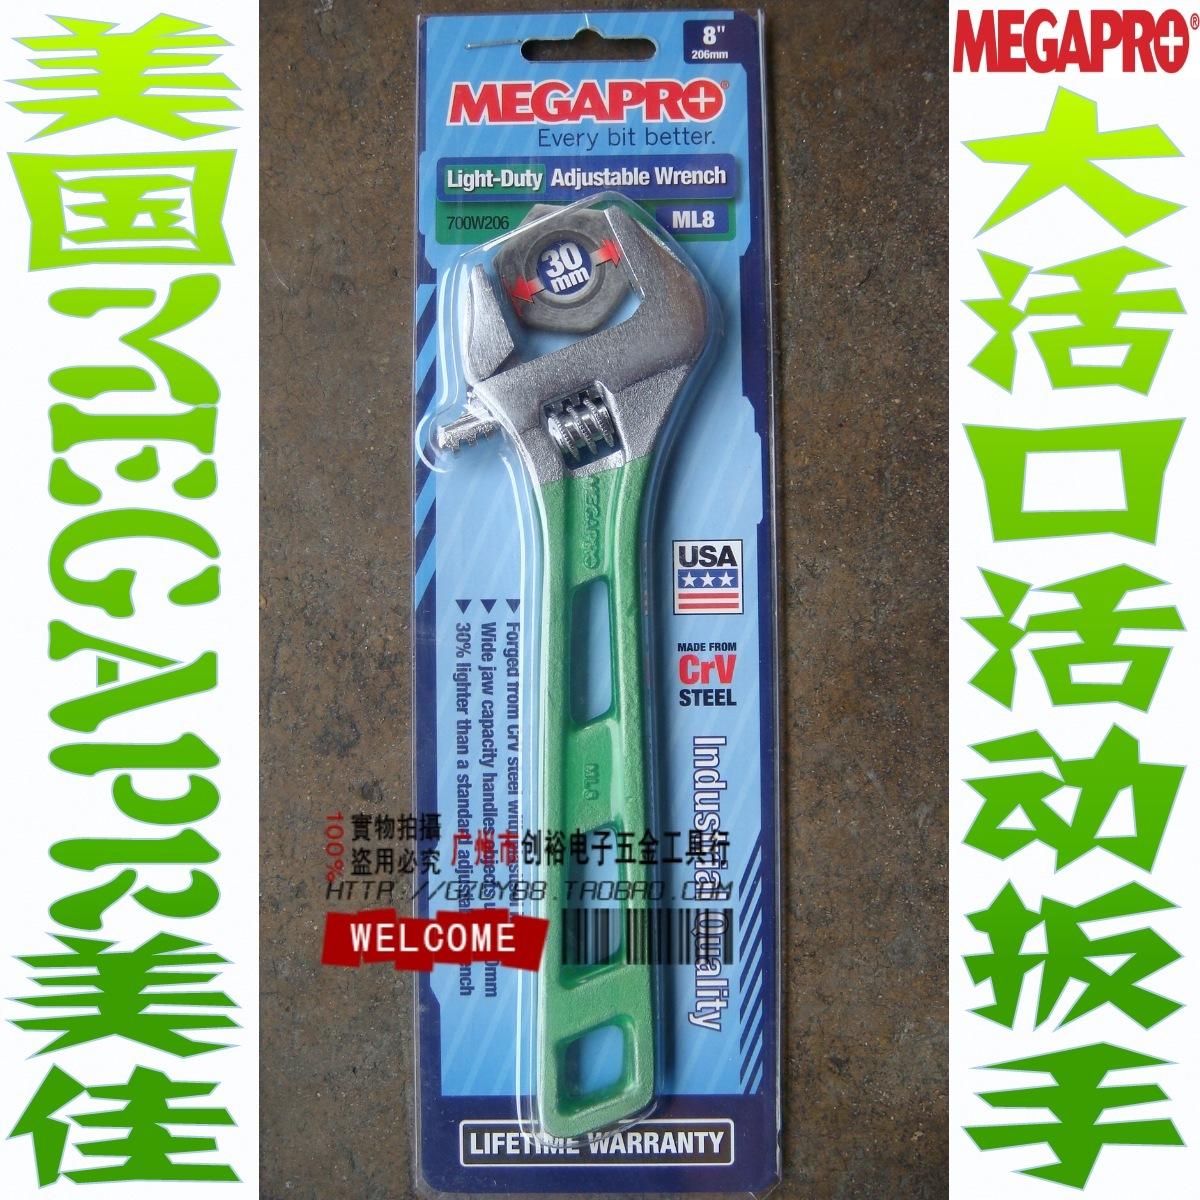 Гаечный ключ United States megapr meijia MEGAPR ML8 30mm travels in the united states etc during 1849 and 1850